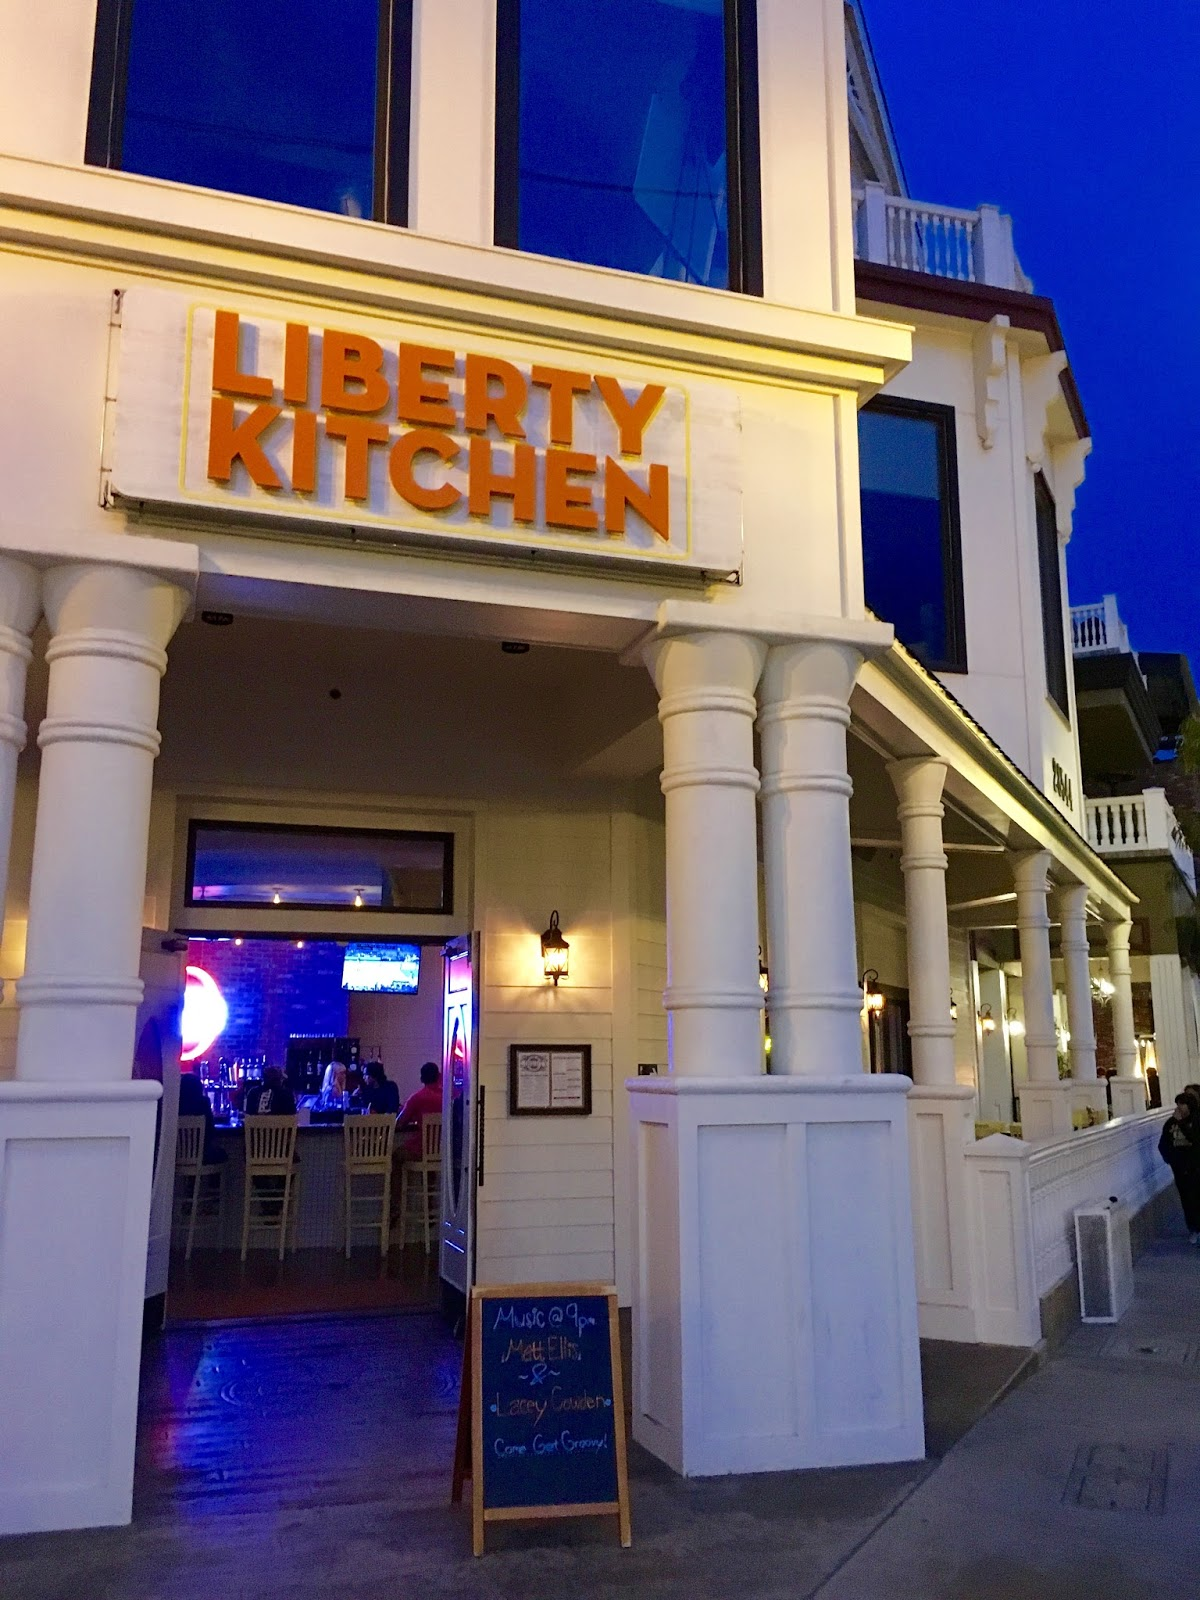 Liberty Kitchen : Blogtown: Temeculas Liberty Kitchen - Ramble On!